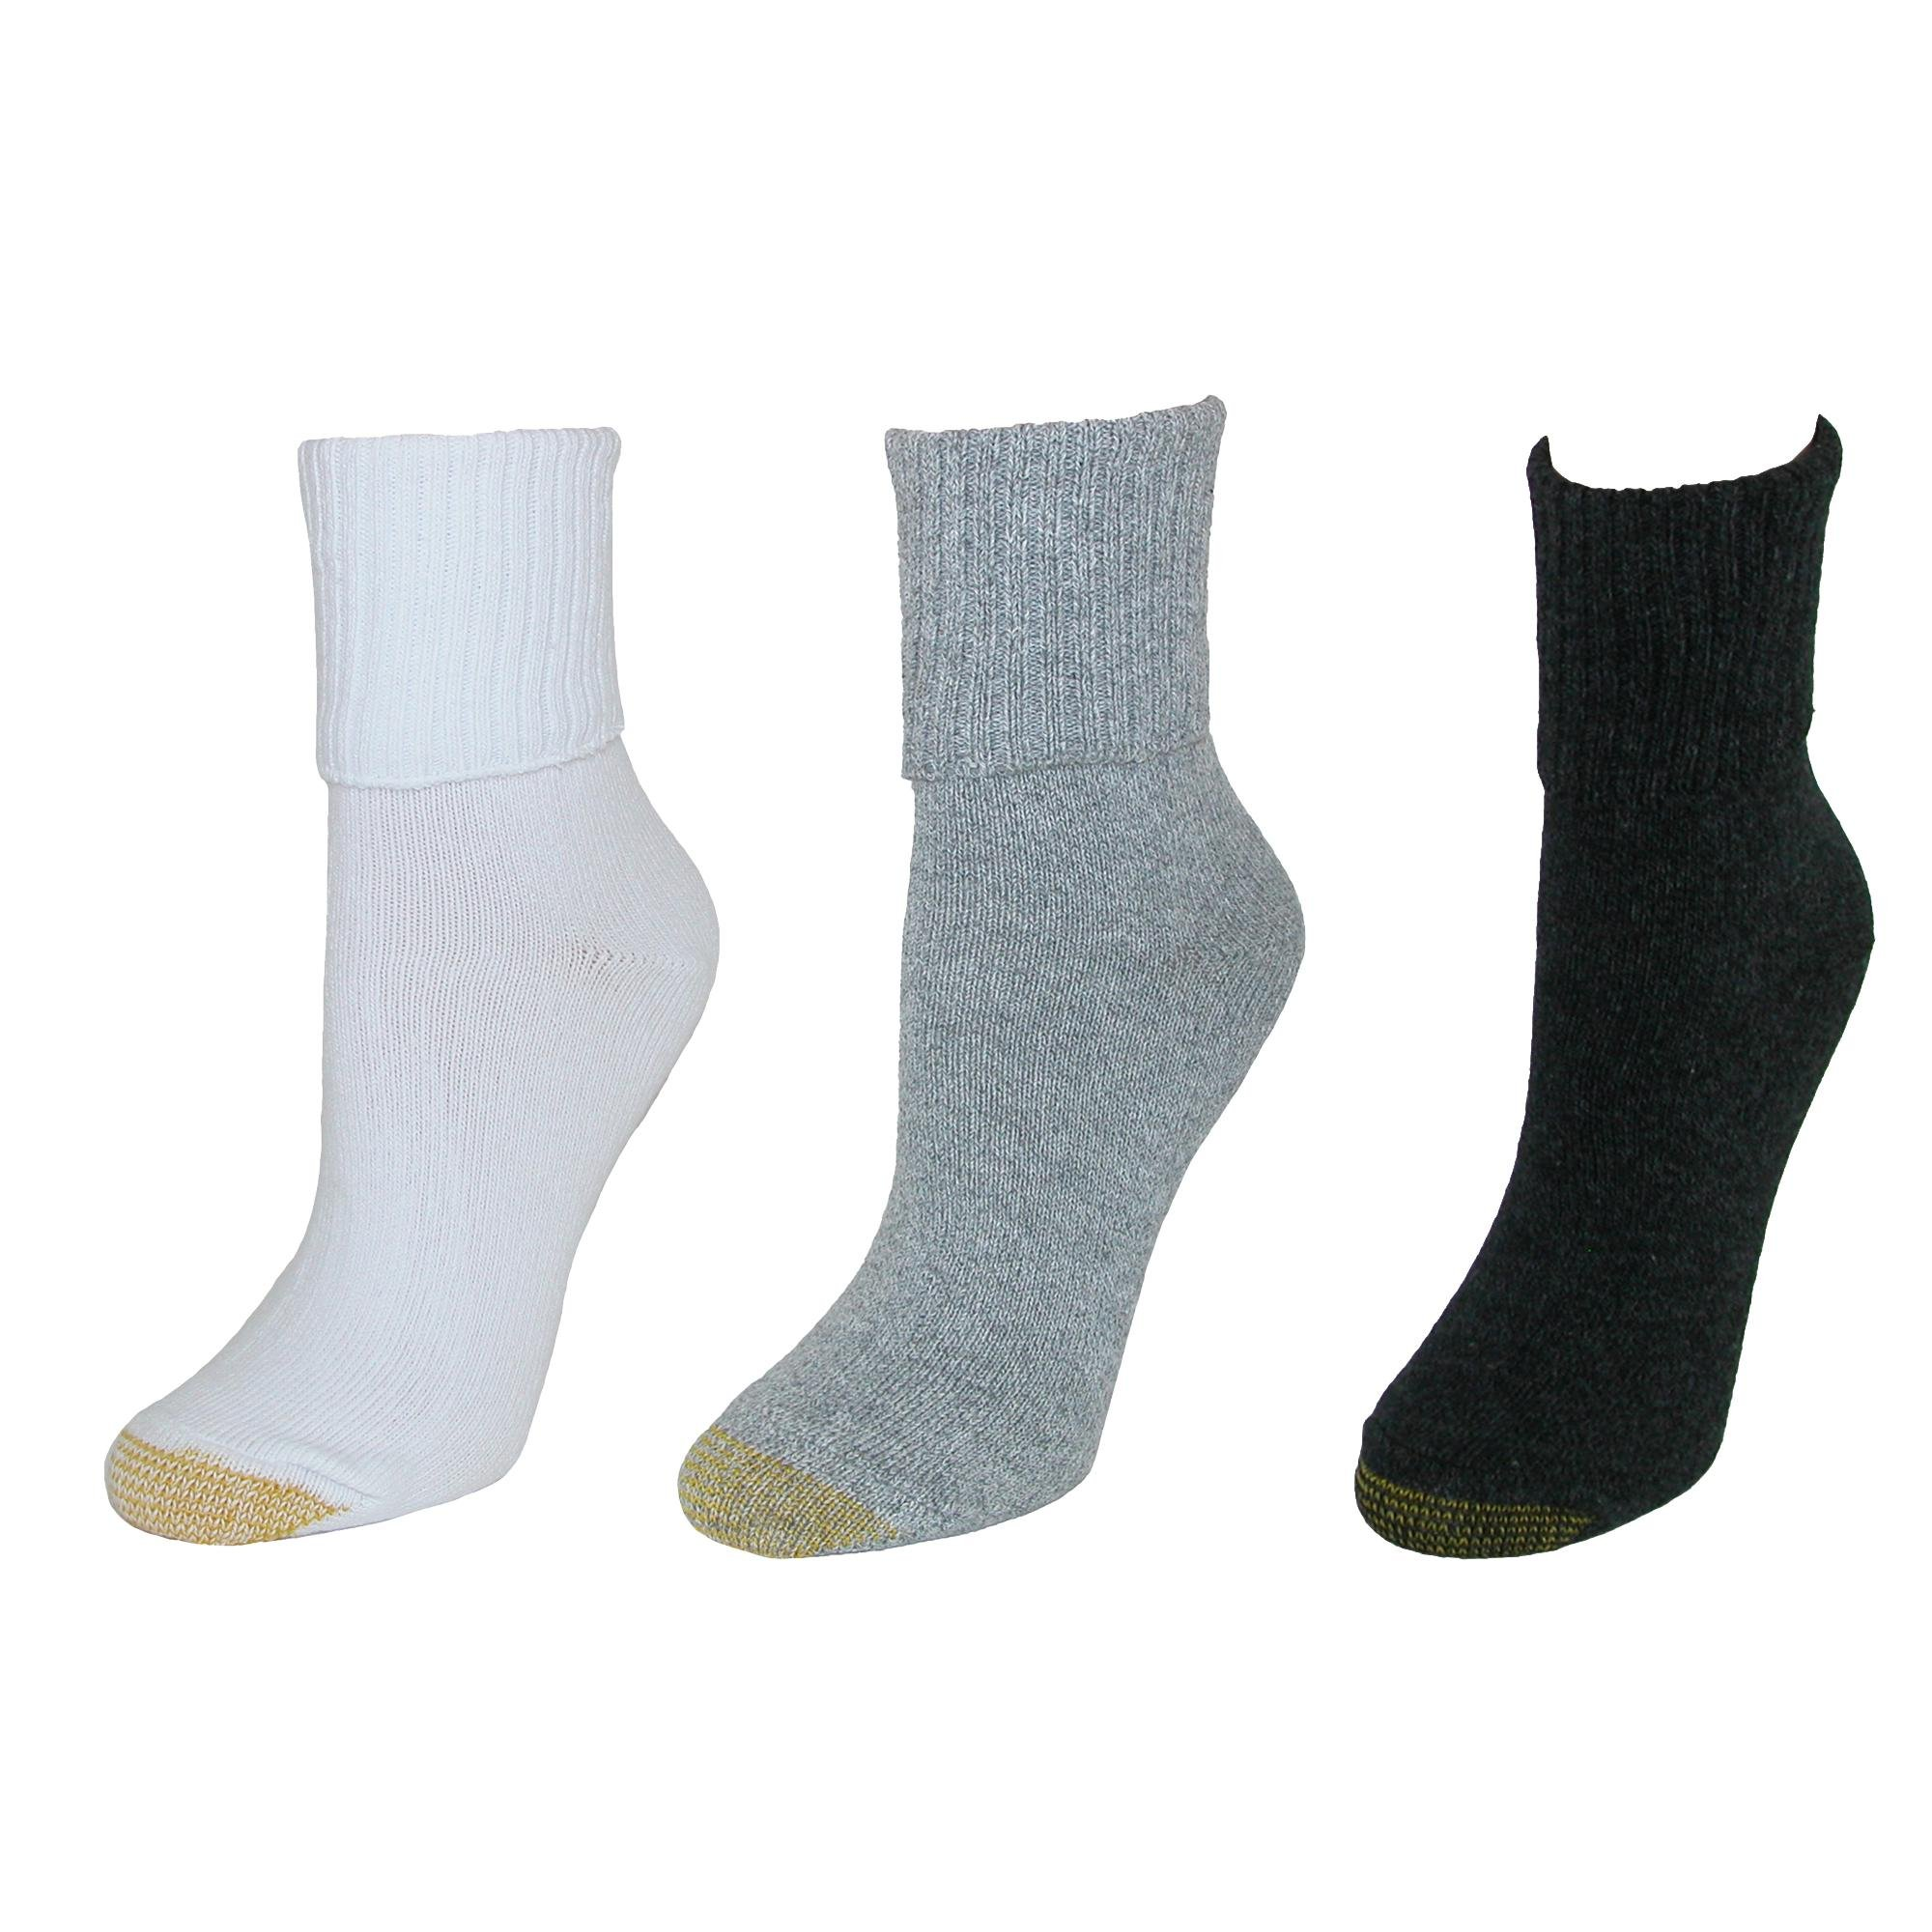 Gold Toe Women's Turn Cuff Bermuda Socks (3 Pair Pack), Grey and White